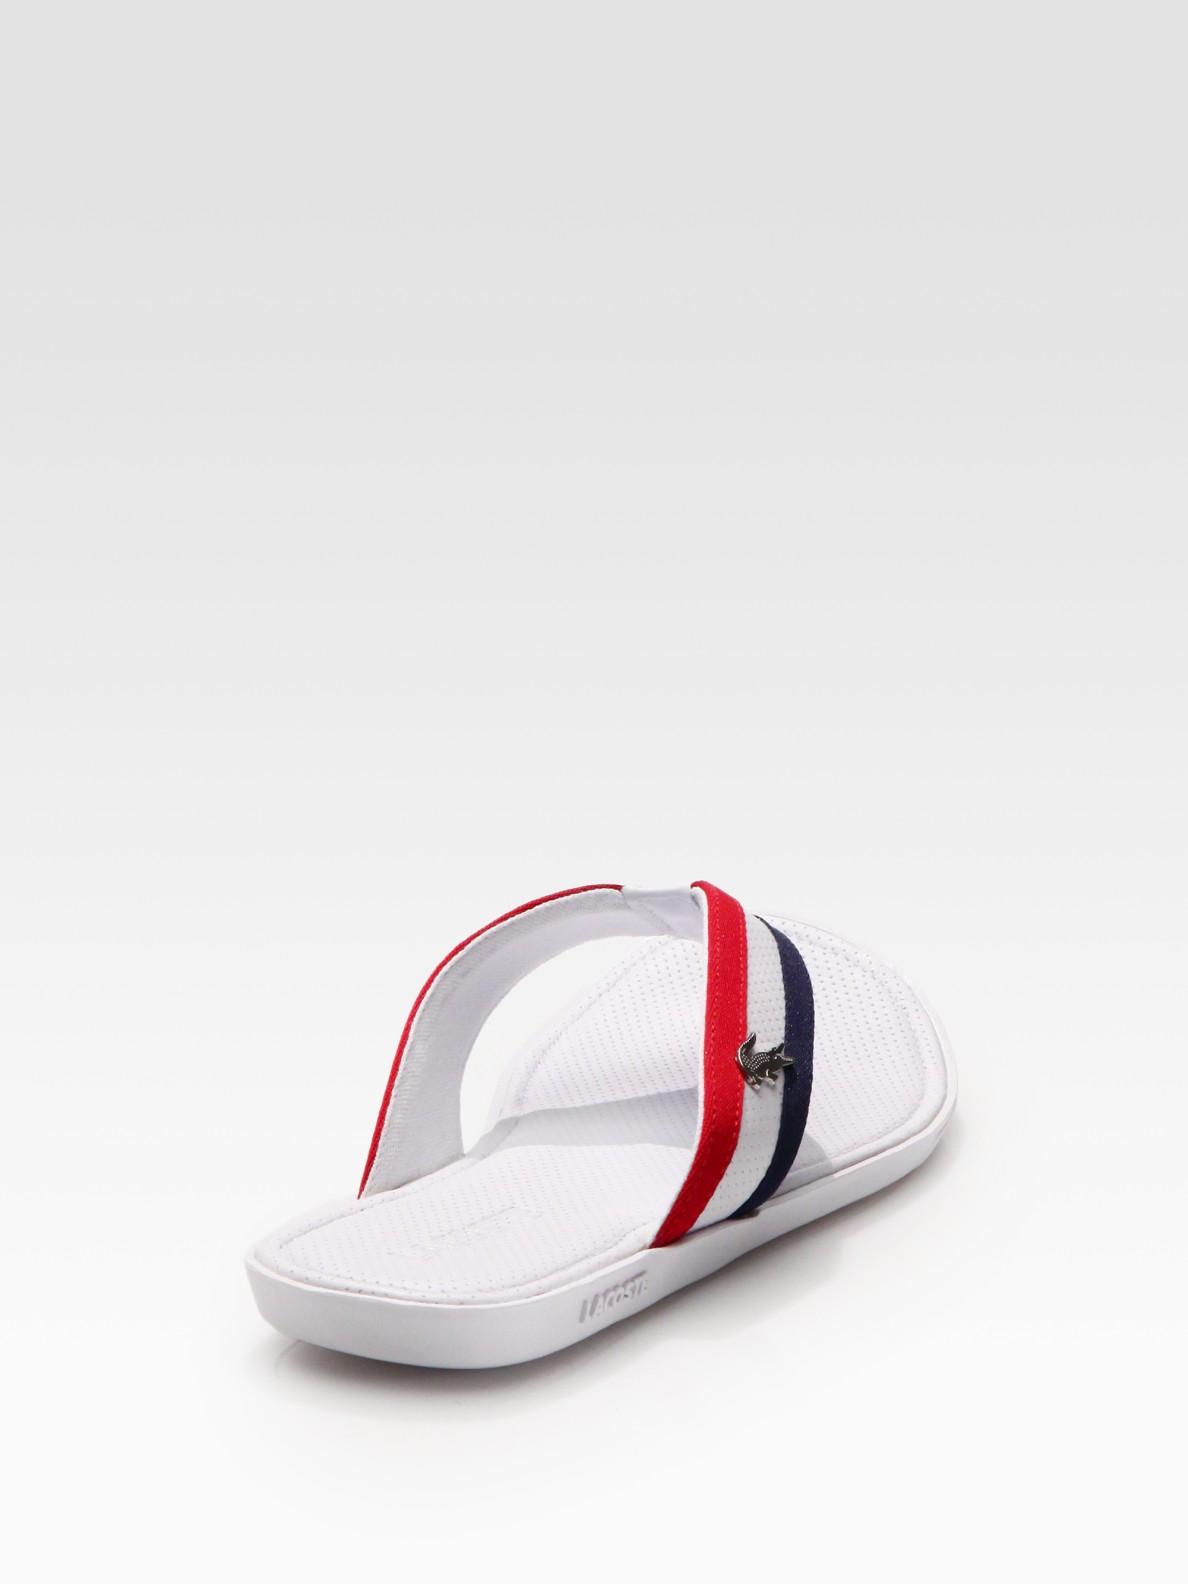 935e89477 Lyst - Lacoste Carros Striped Flip-flop in White for Men